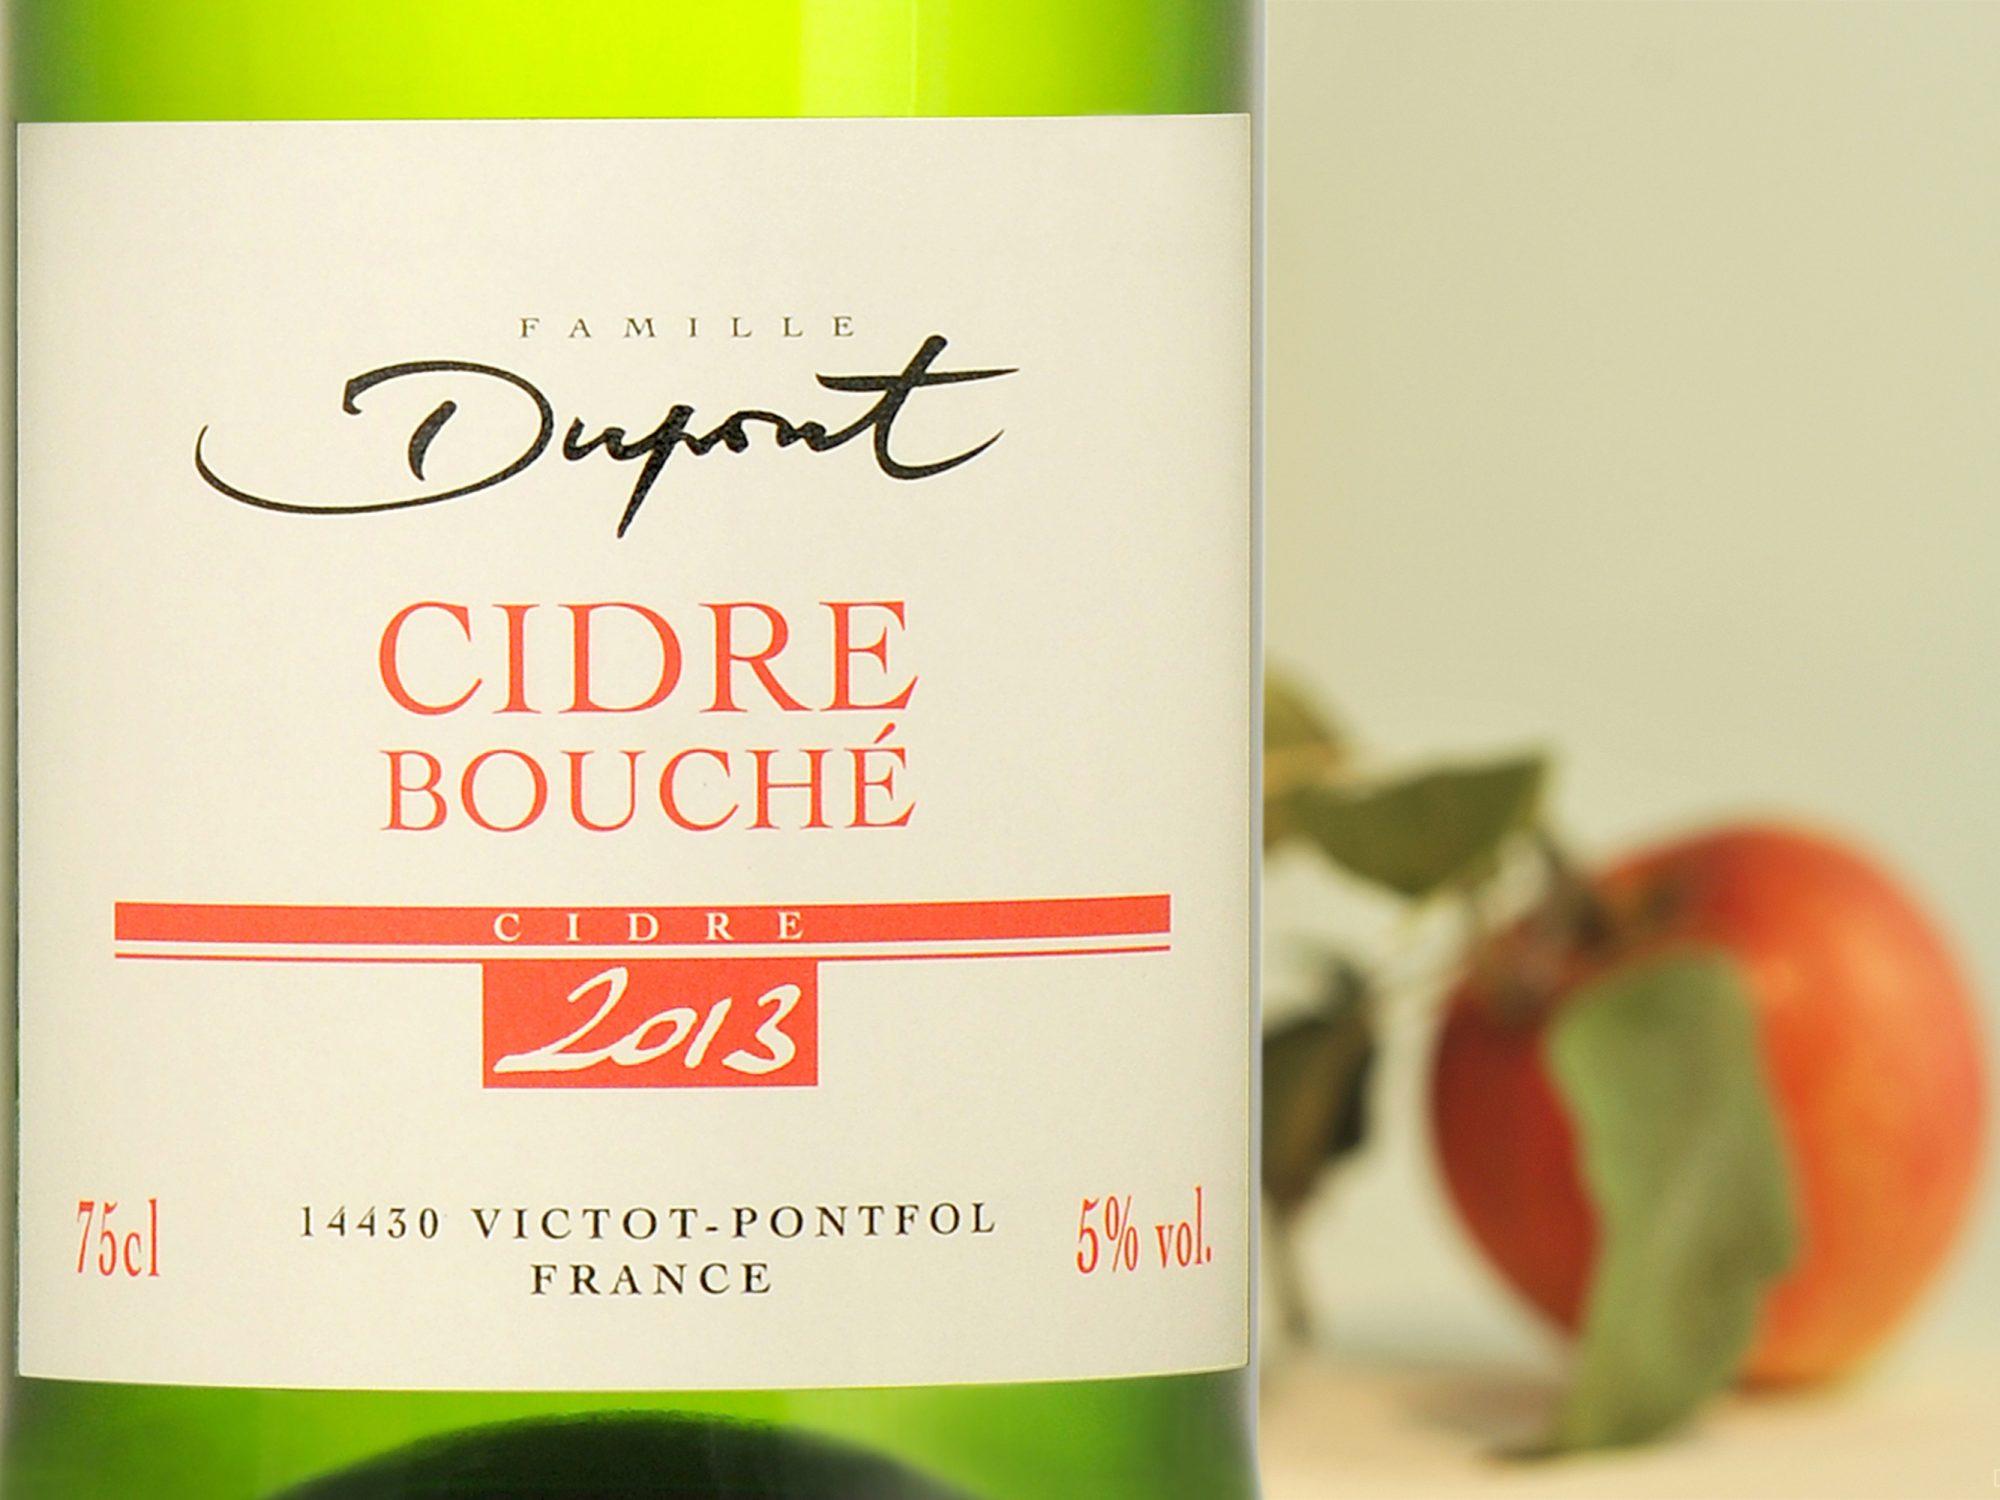 Famille Dupont Cidre Bouche